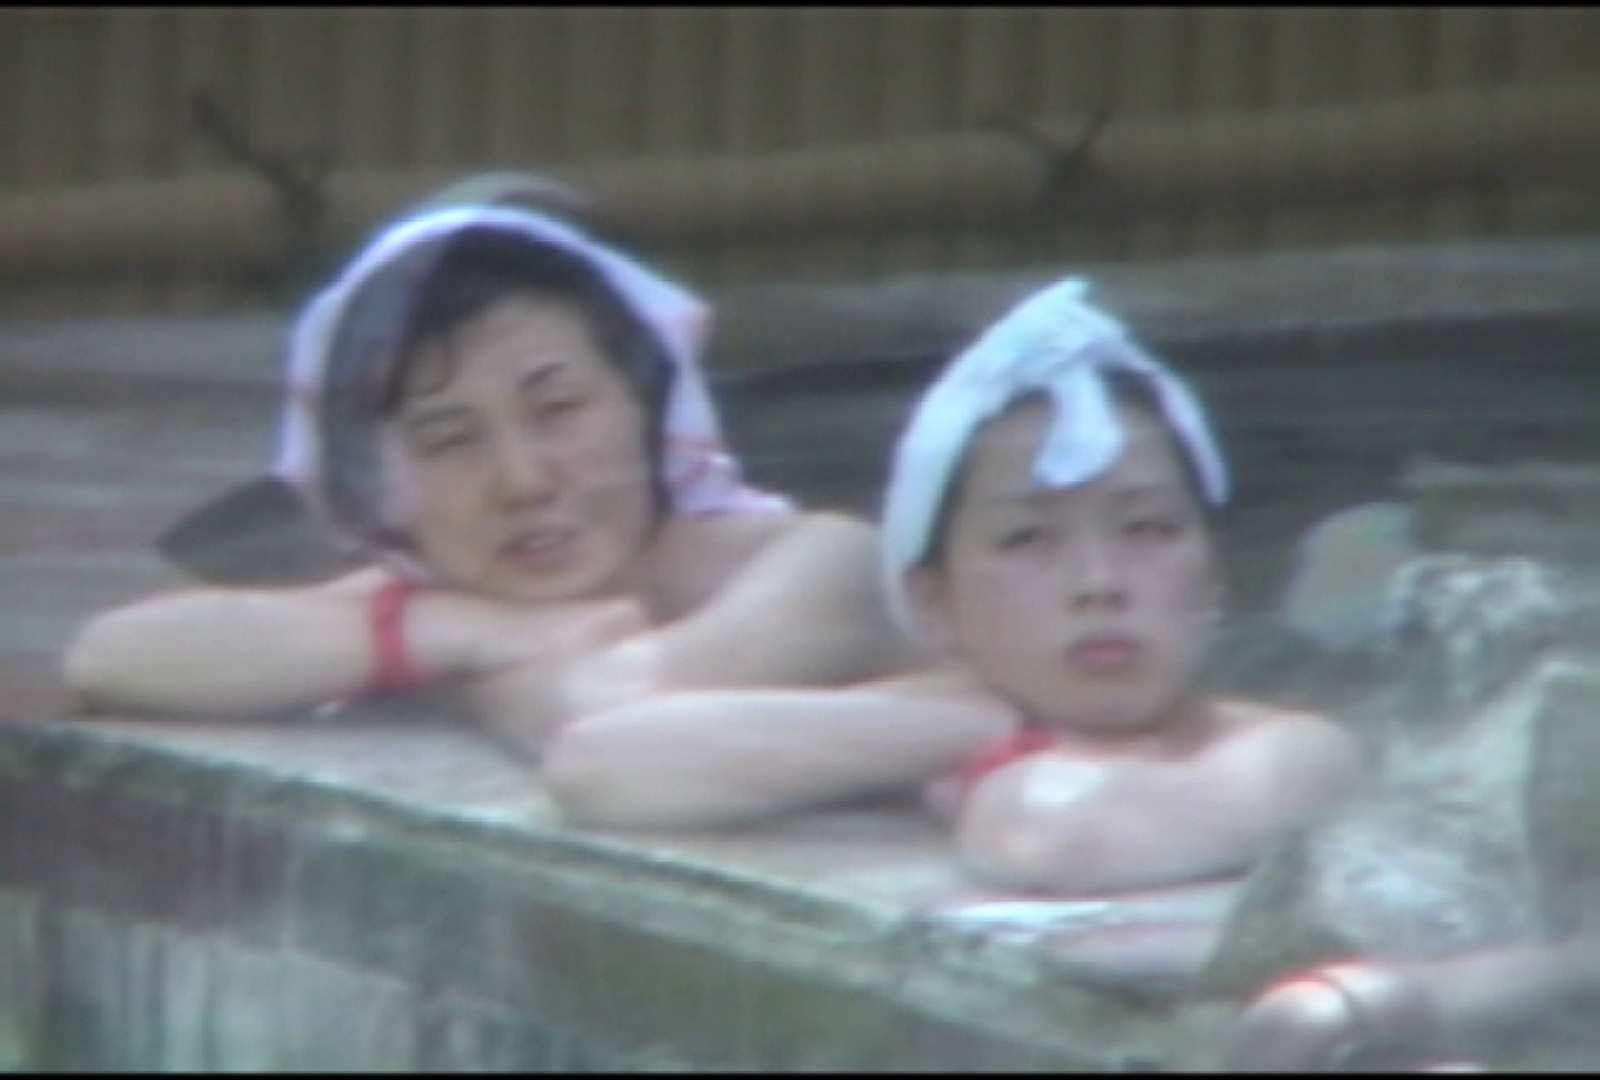 Aquaな露天風呂Vol.146 盗撮映像  73Pix 1